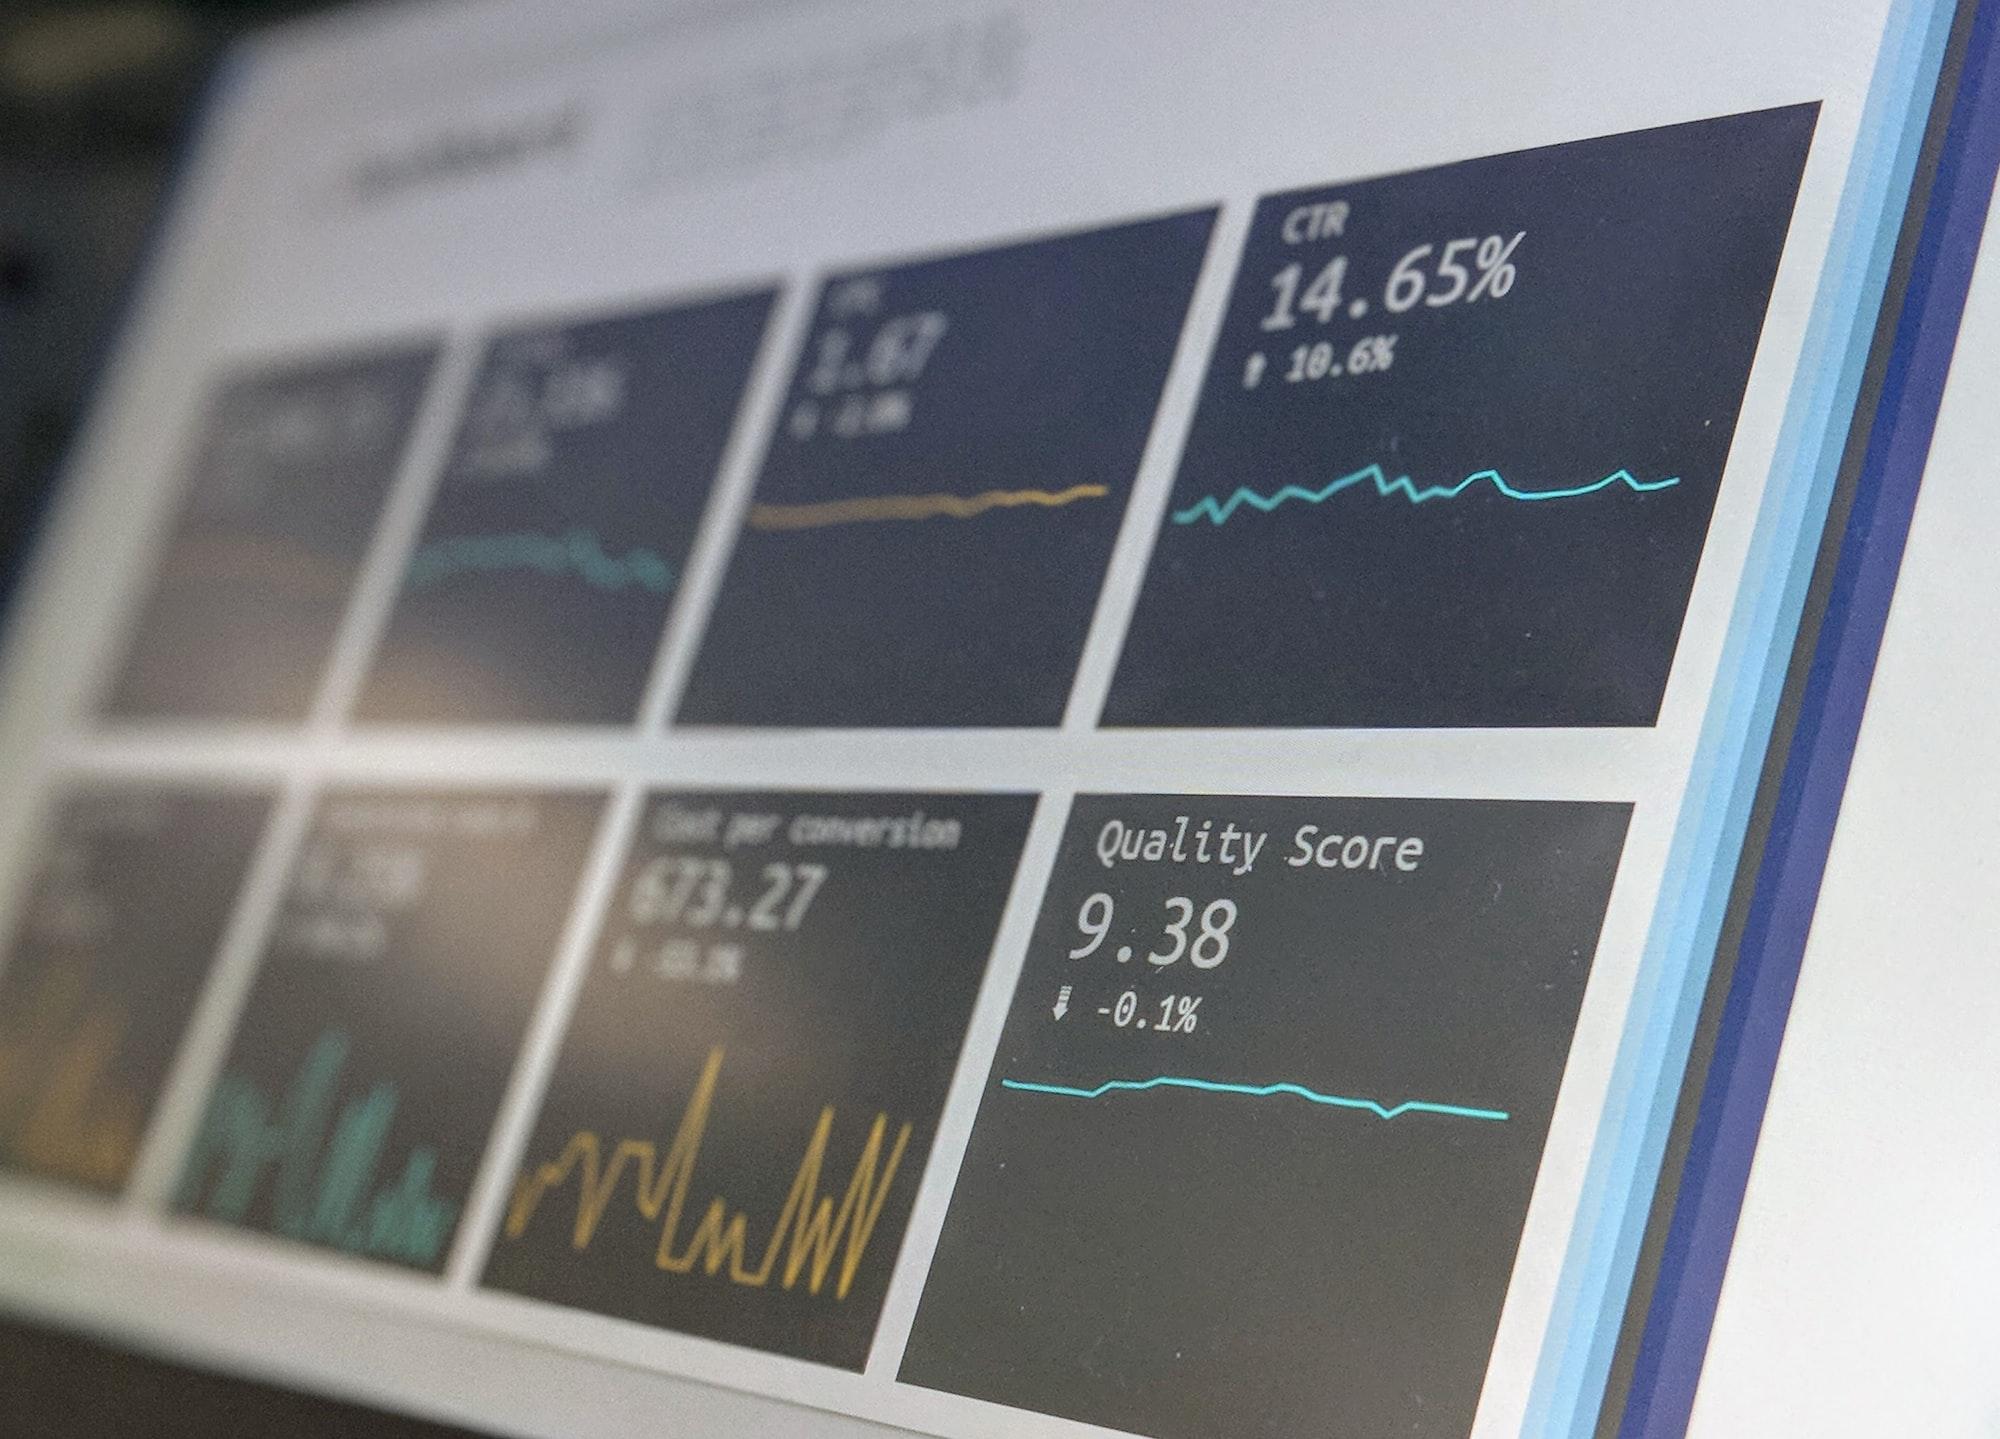 Invertir en crisis ¿Plazos fijos o fondos comunes de inversión?